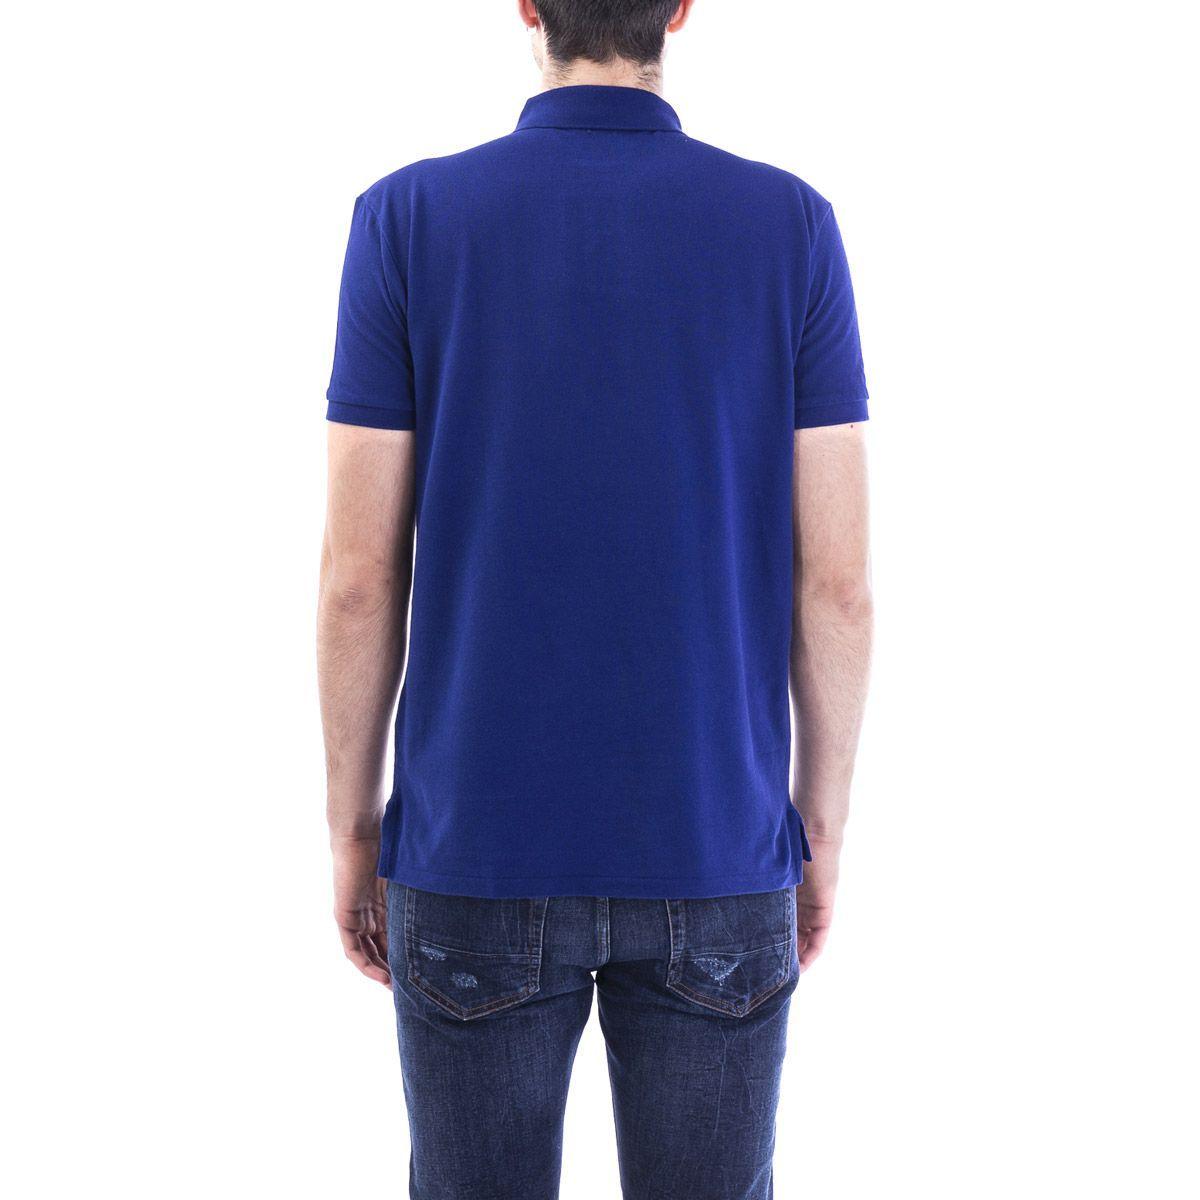 RALPH LAUREN MEN'S 710795080013 BLUE COTTON POLO SHIRT